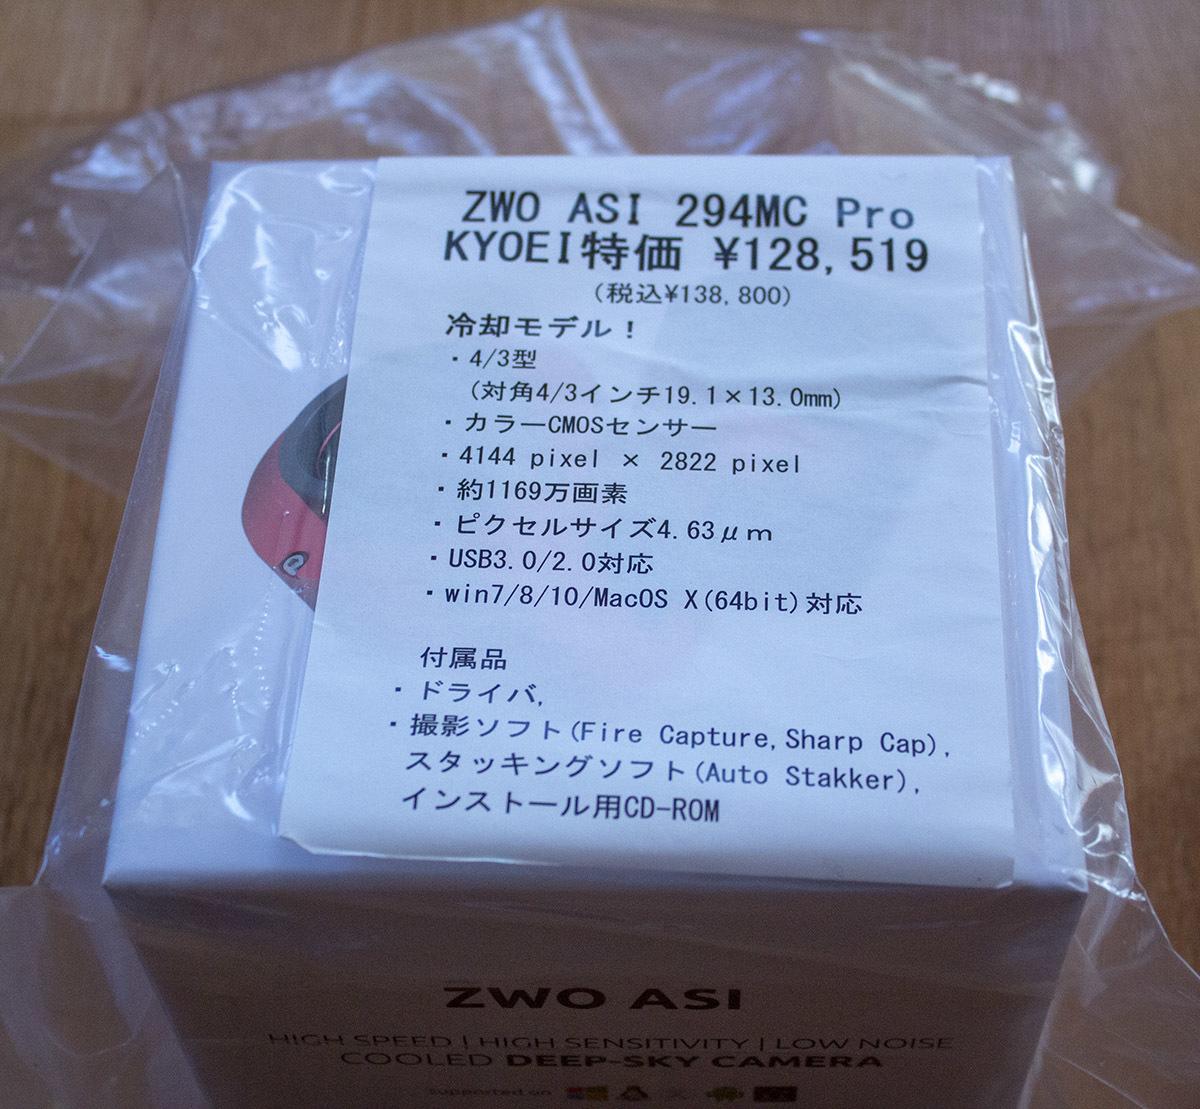 ASI294MC PRO 到着 開封しました_e0174091_15440204.jpg